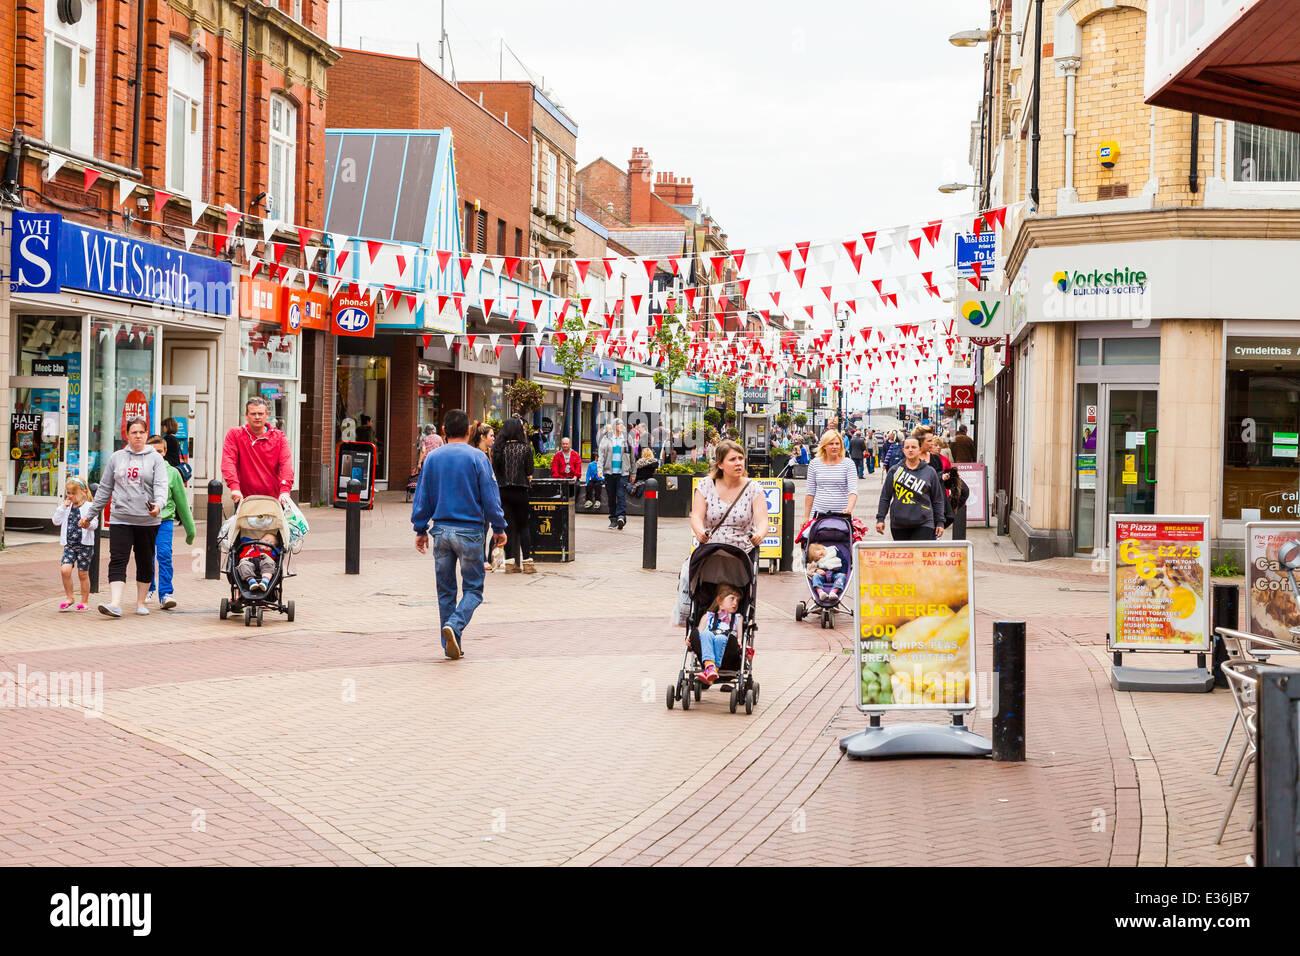 Shoppers in pedestrian precinct. Rhyl town center, Denbighshire, Great Britain. - Stock Image